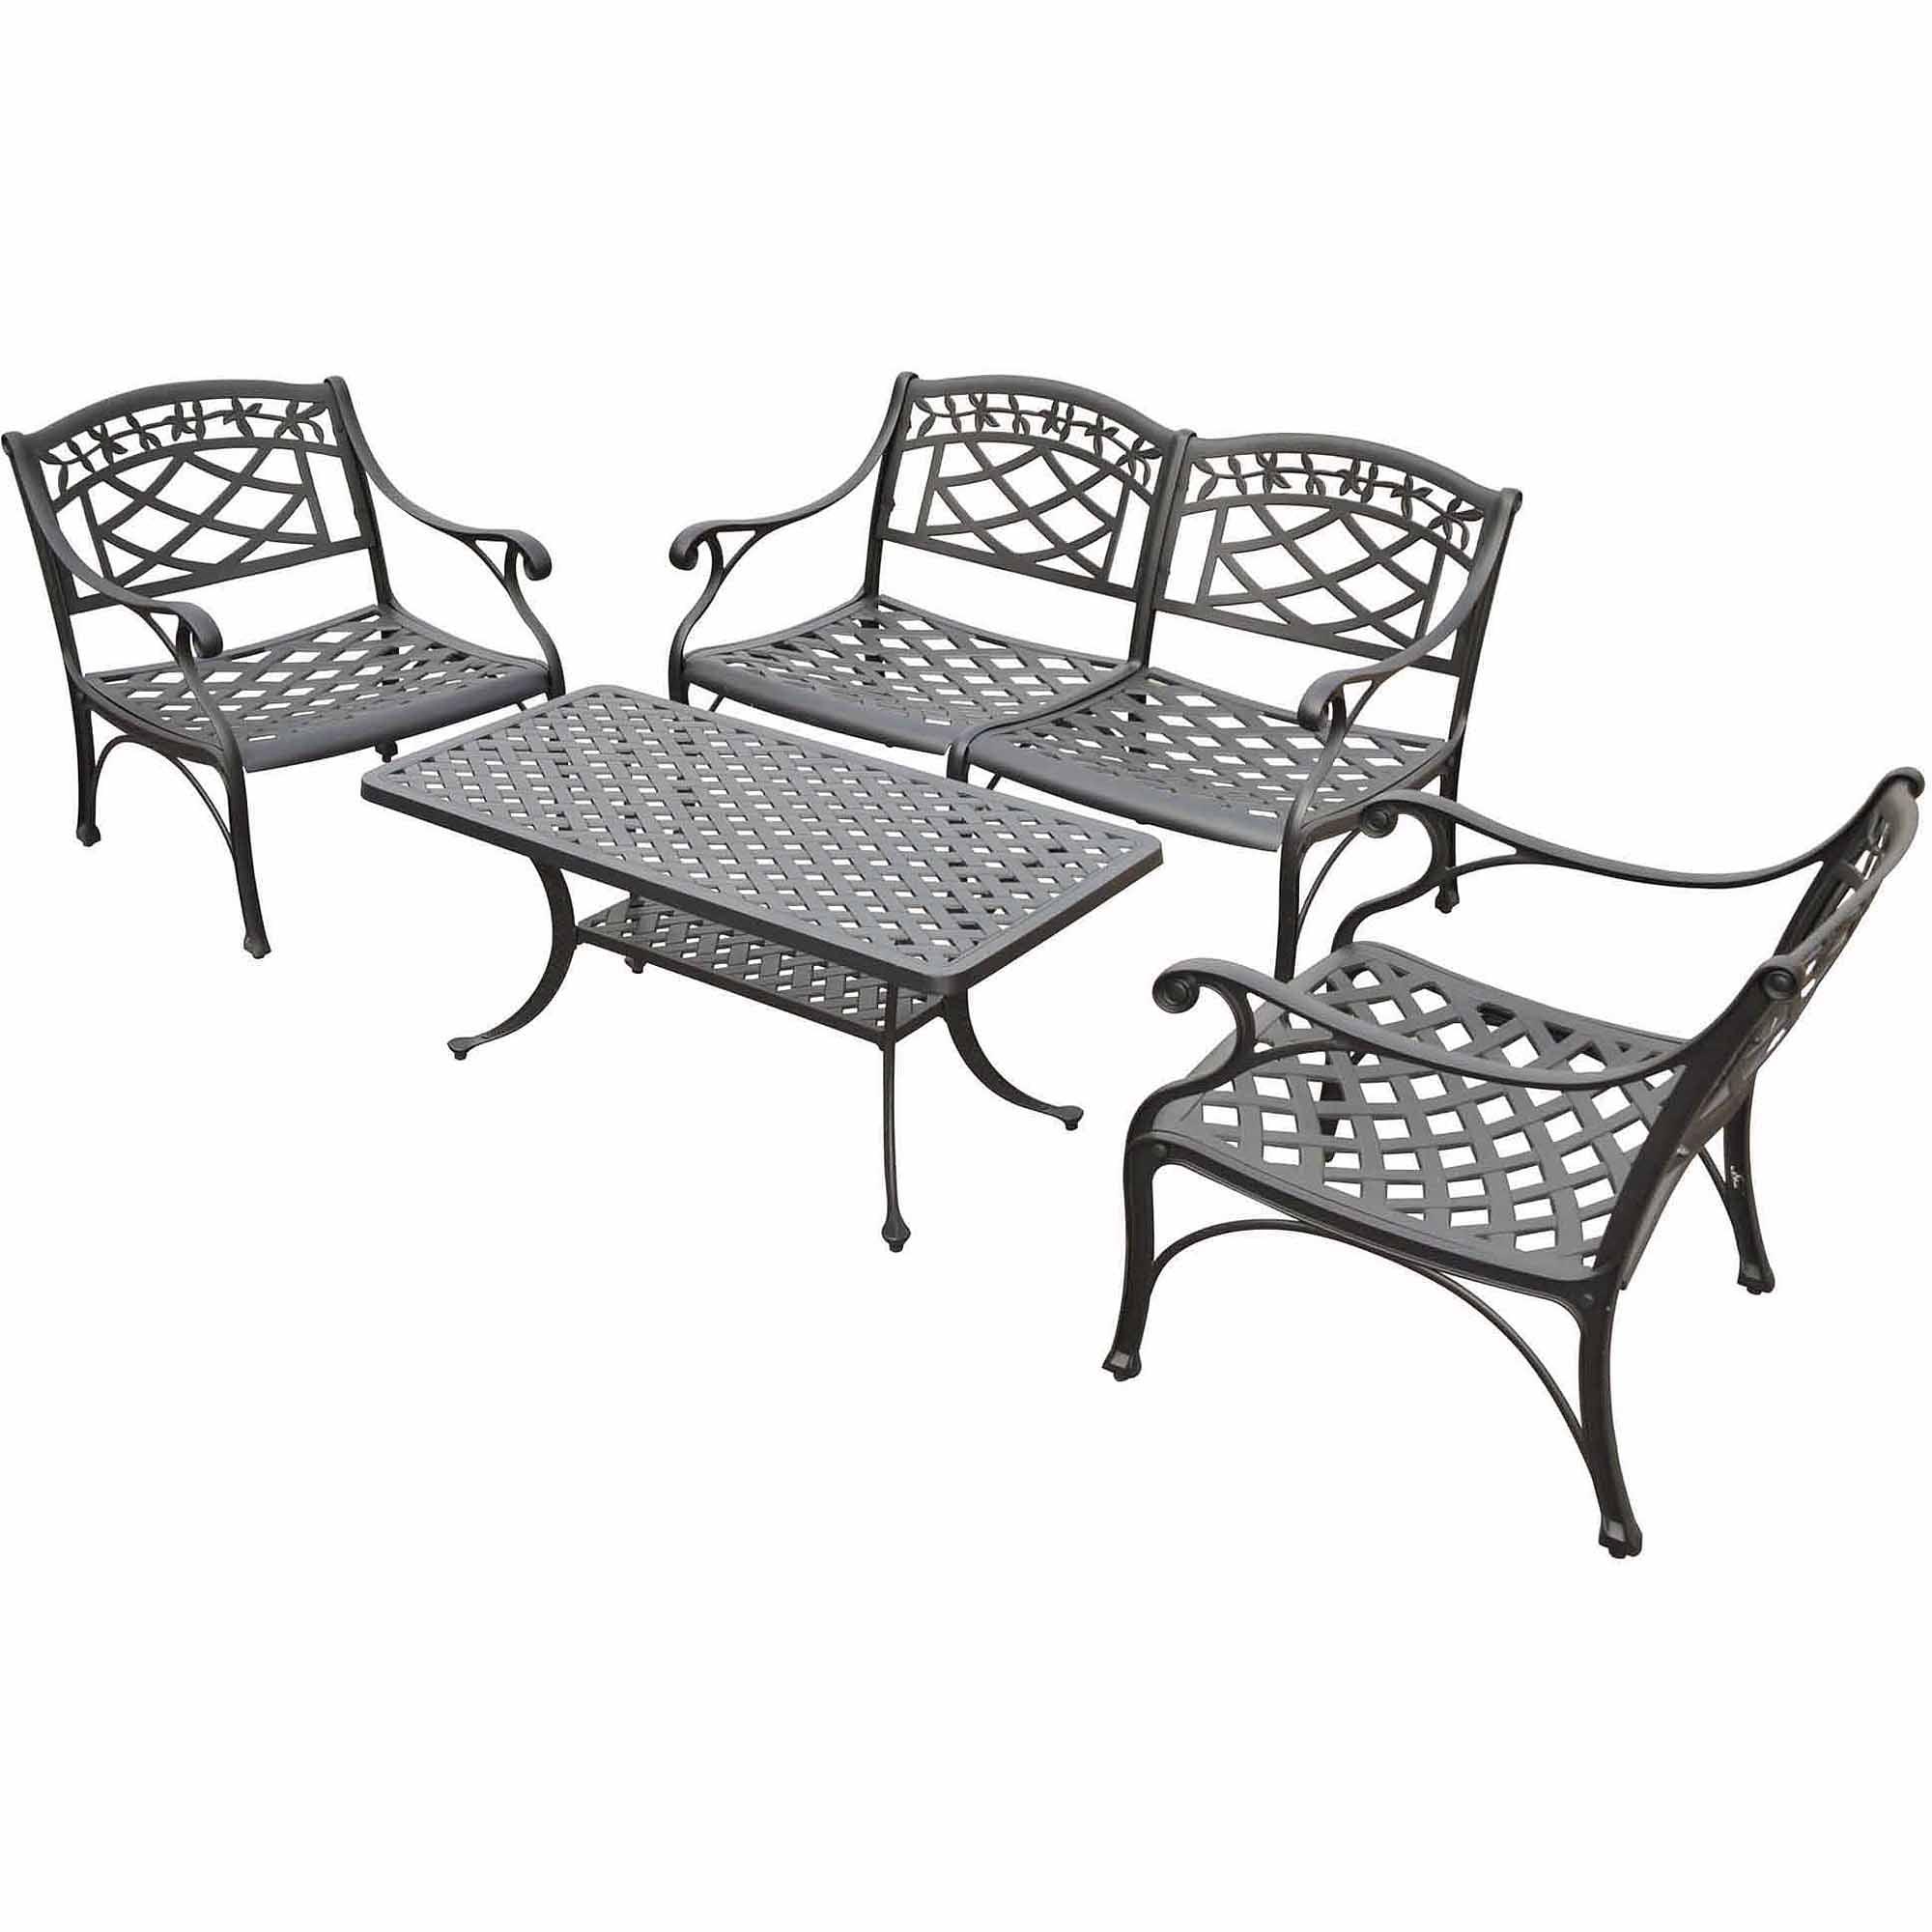 Crosley Furniture Sedona 4 Piece Cast Aluminum Outdoor Conversation Seating  Set   Walmart.com